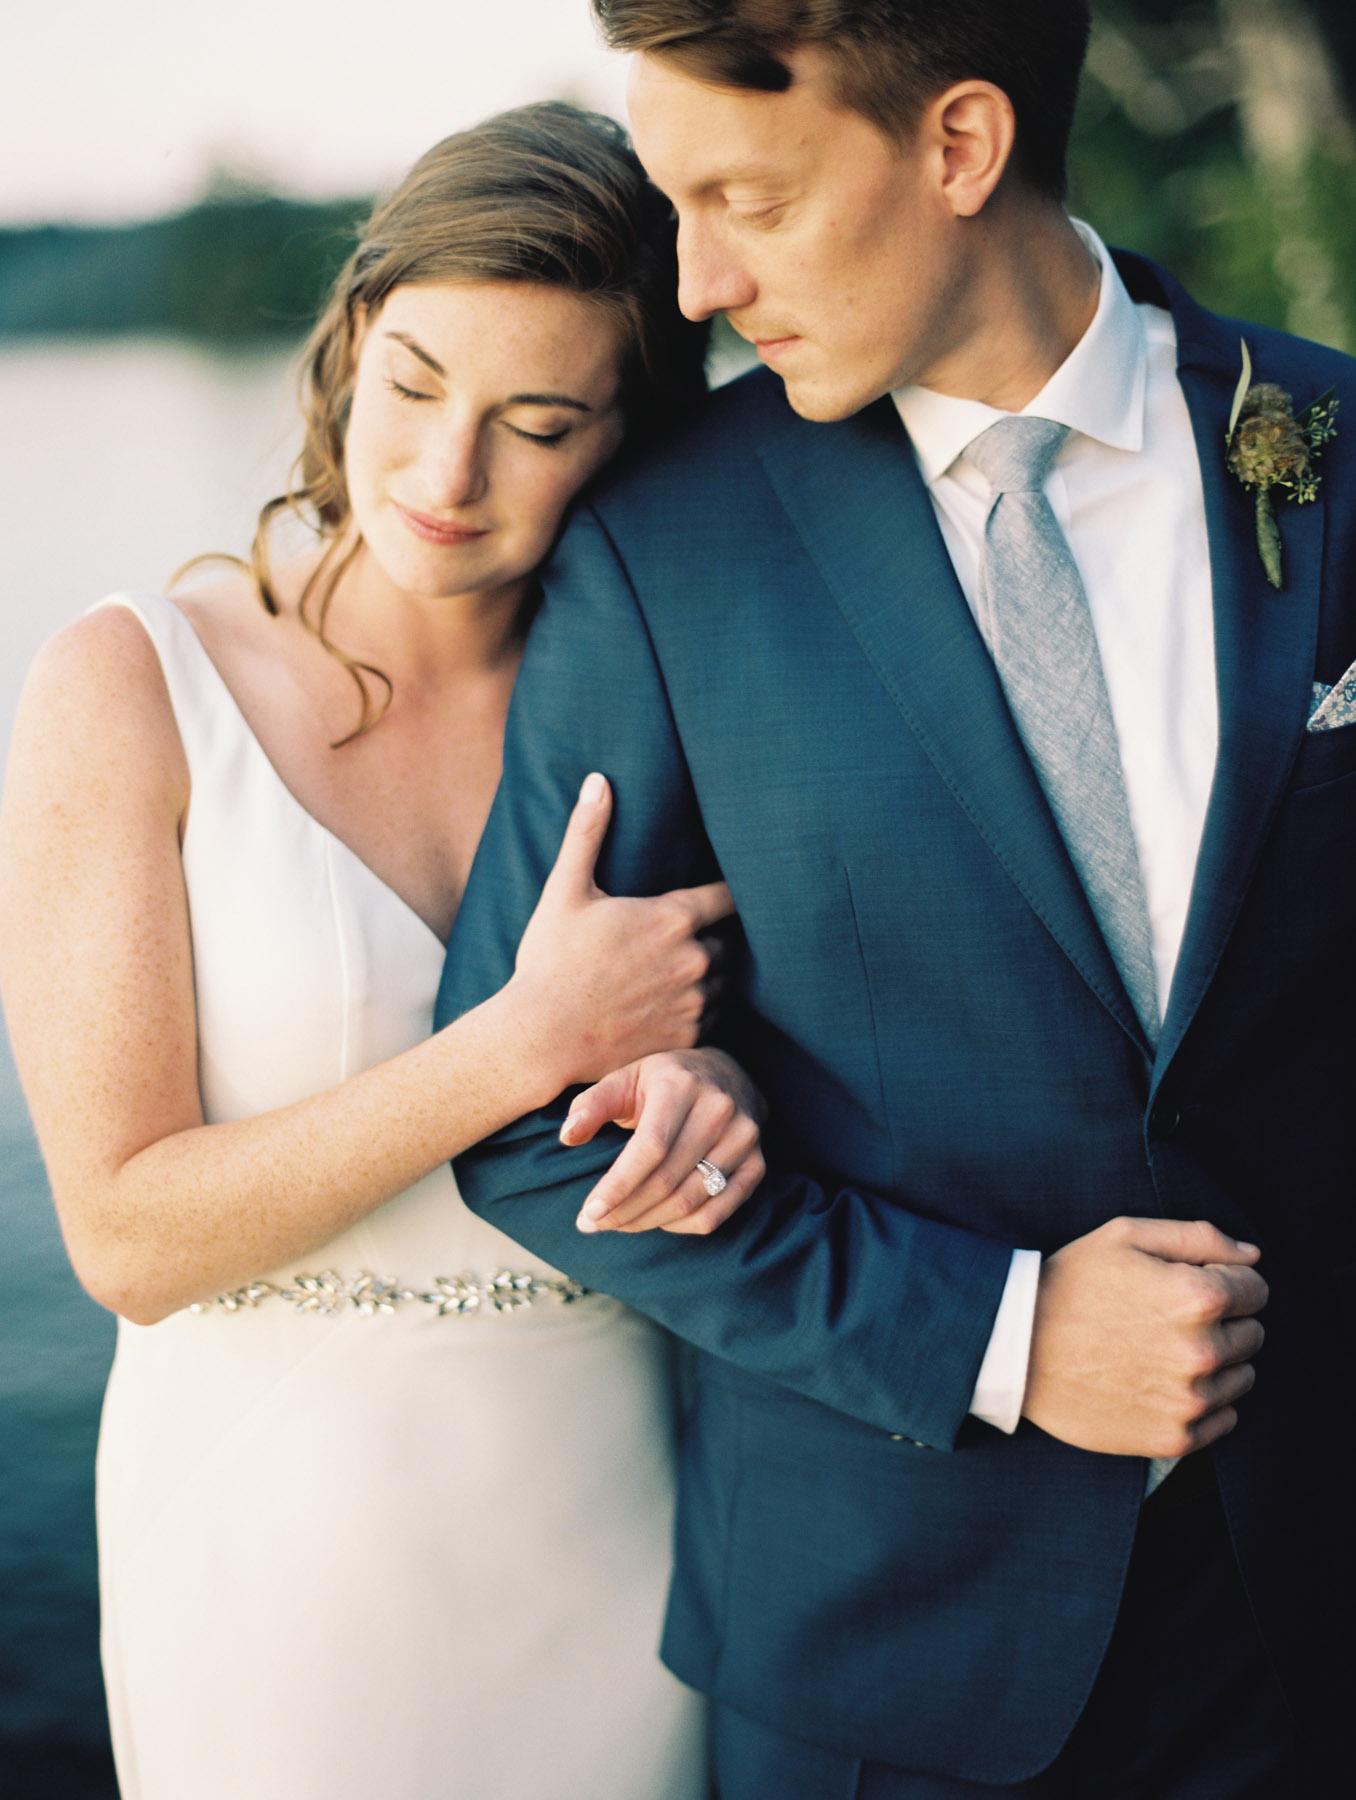 Wedding-Photography-Campground-23.jpg